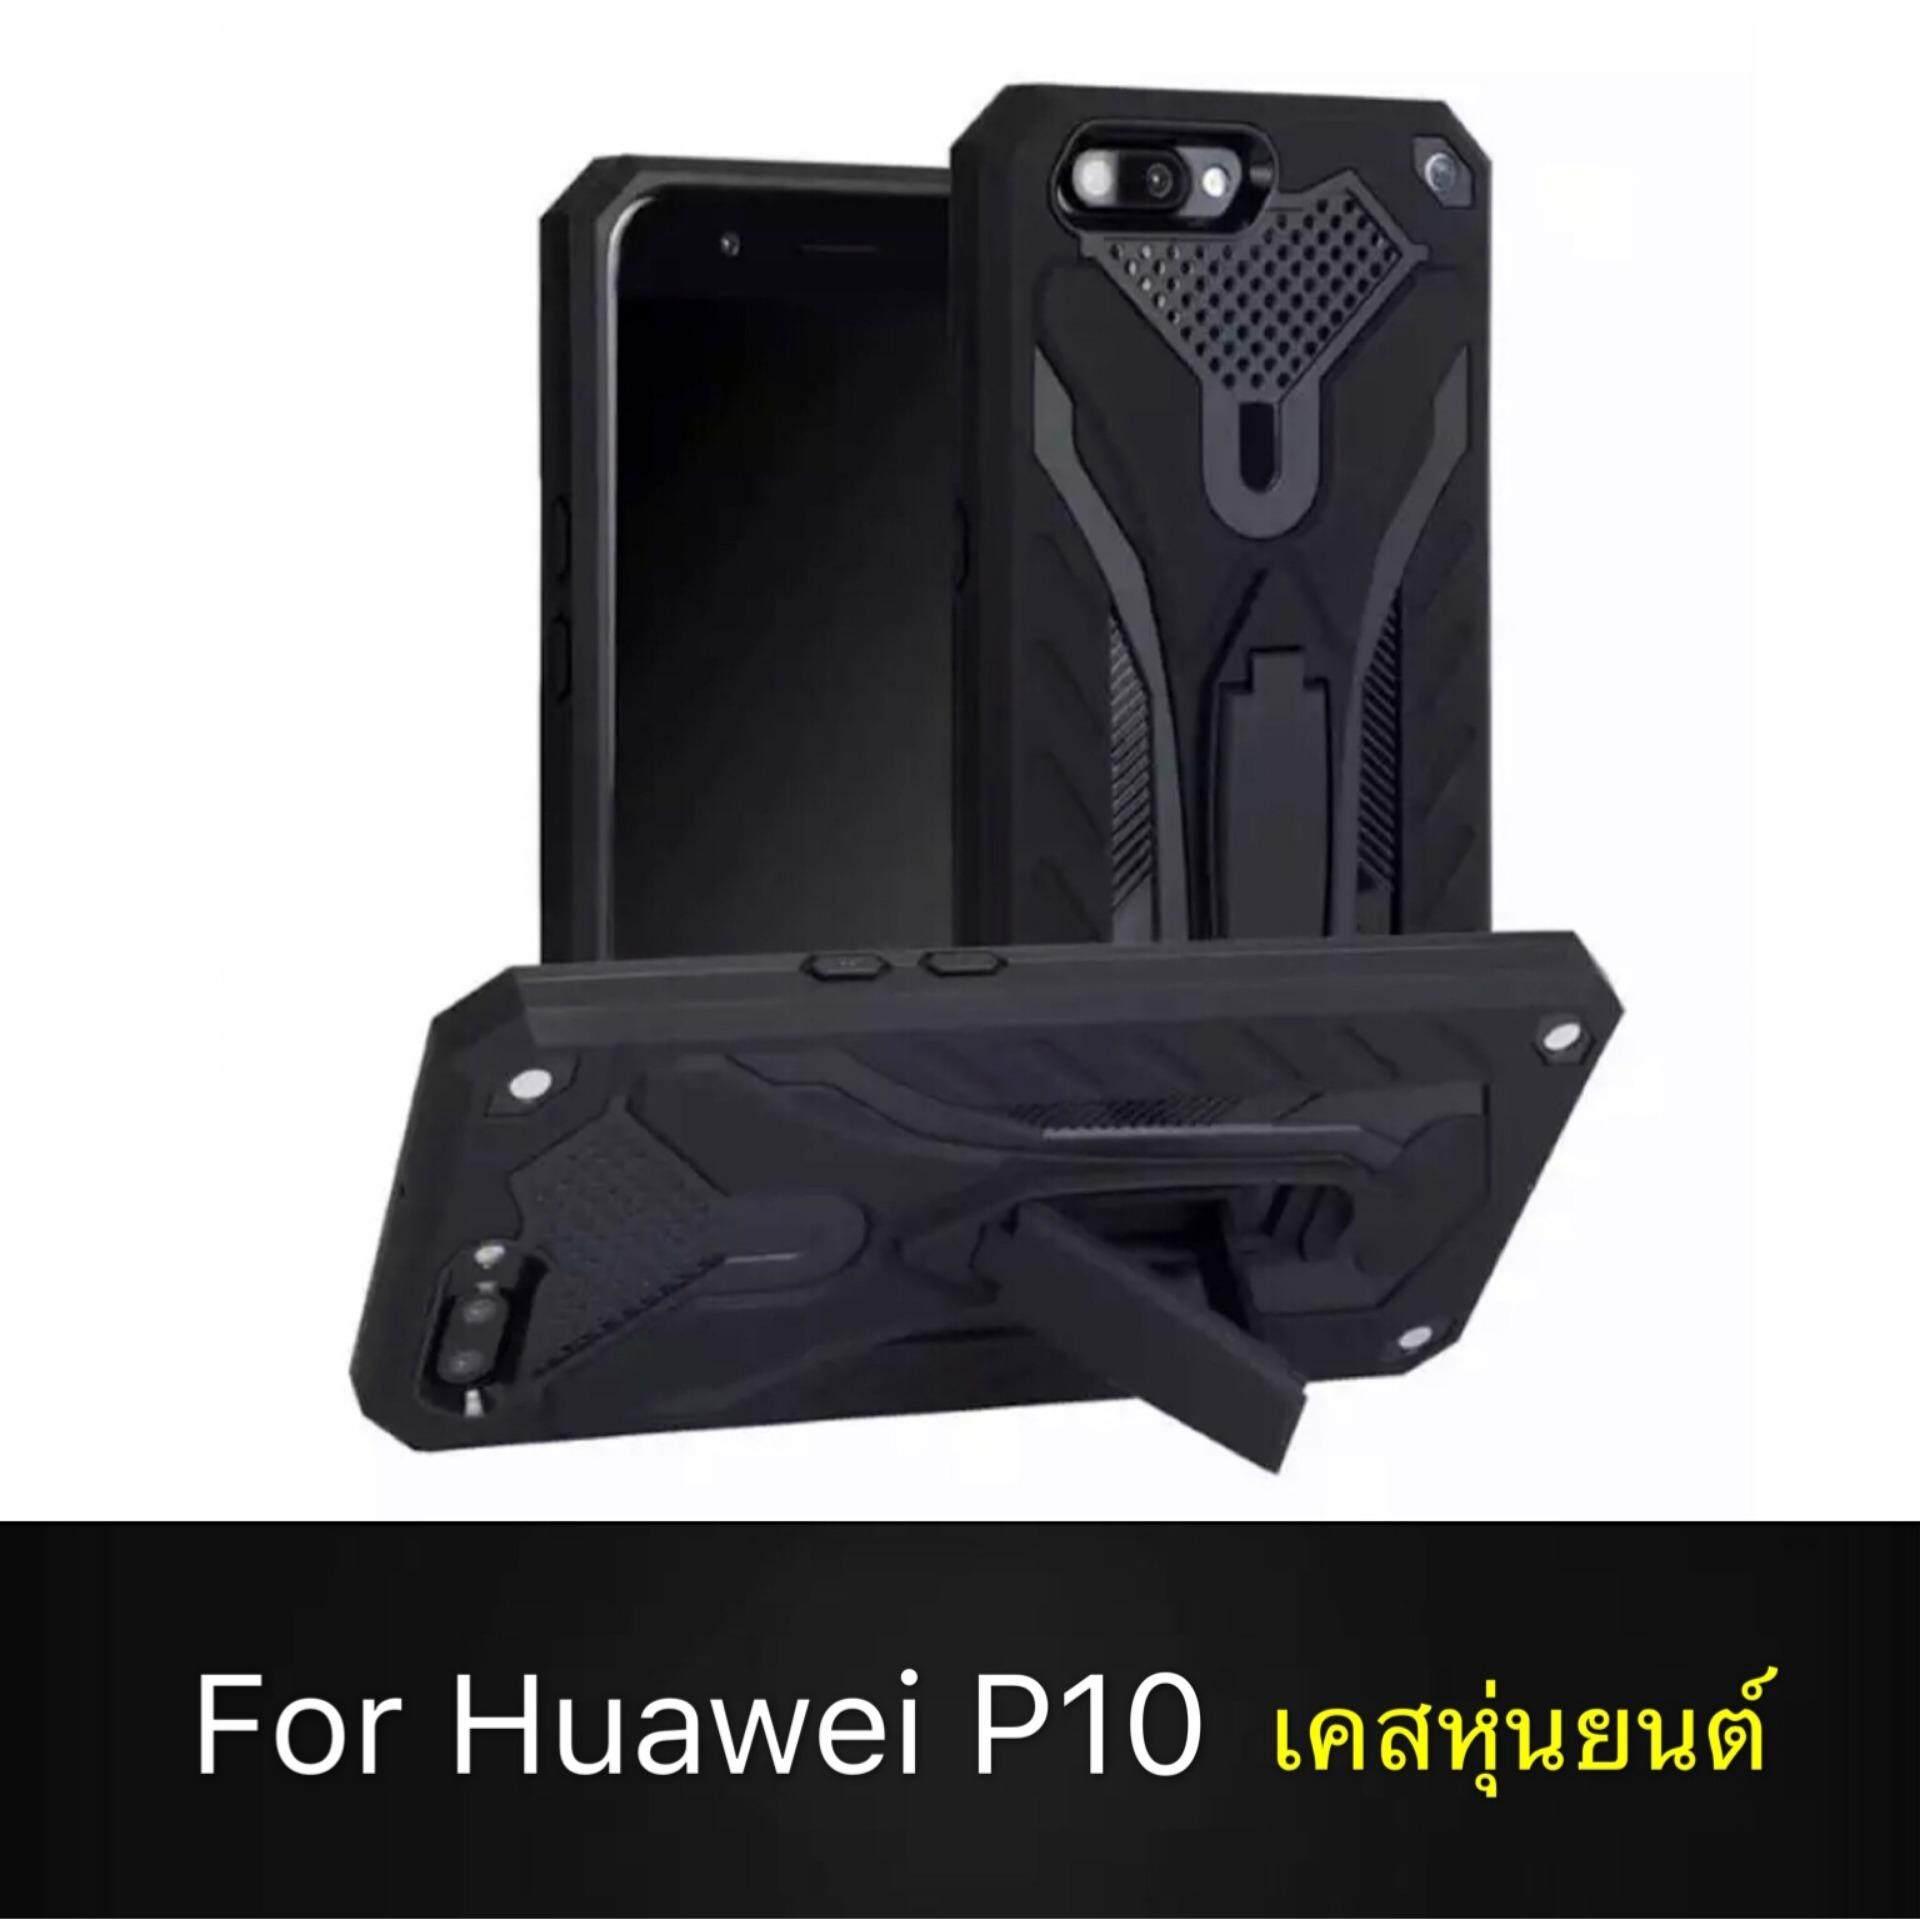 Case Huawei P10 เคสนิ่ม Tpu เคสหุ่นยนต์ เคสไฮบริด มีขาตั้ง เคสกันกระแทก สินค้าใหม่ Tpu Case.